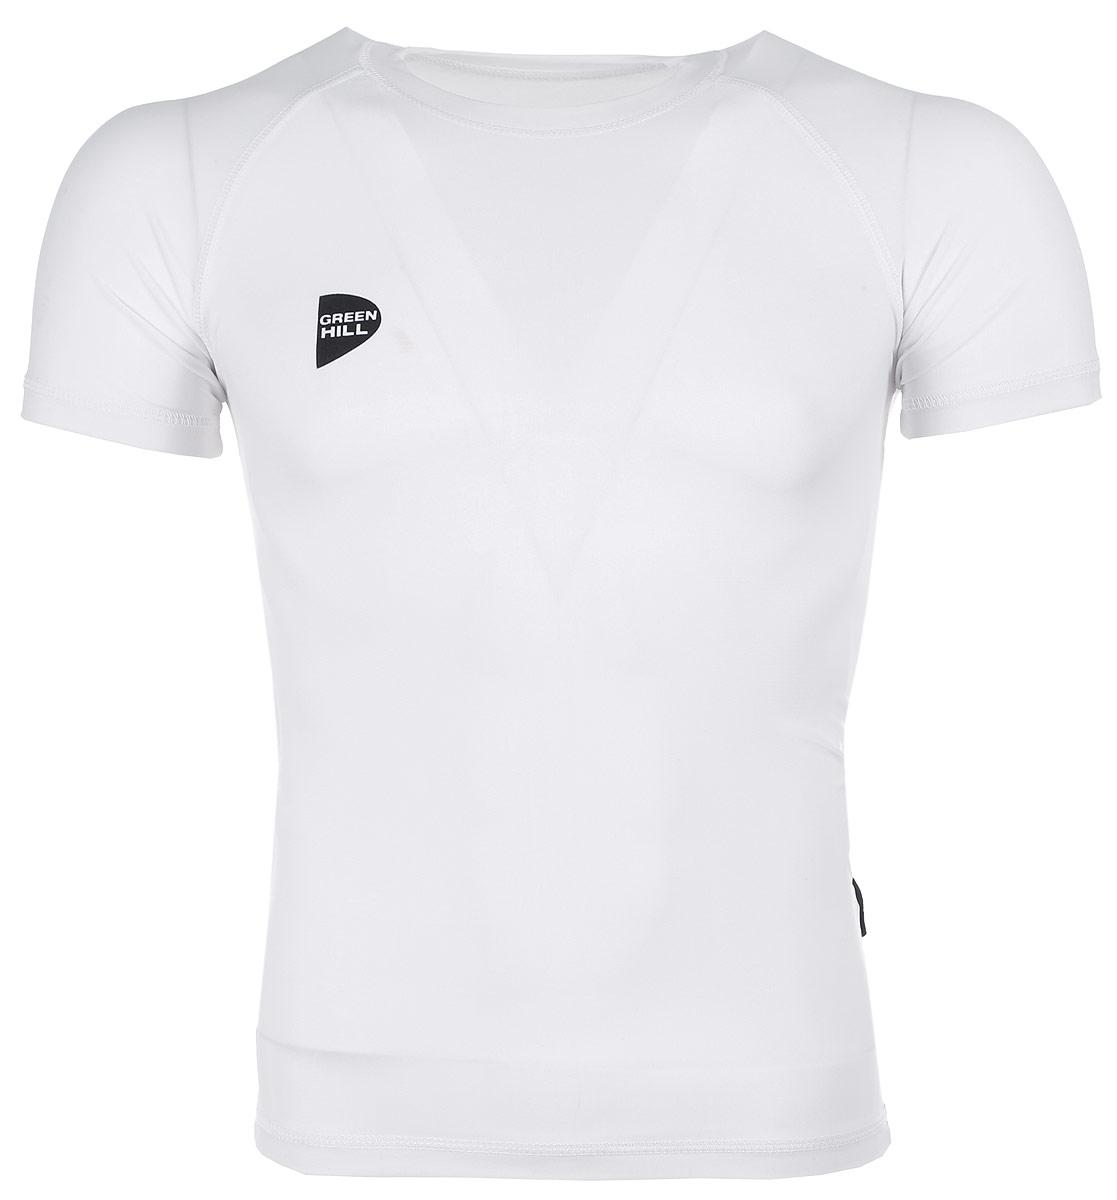 Защитная футболка Green Hill, цвет: белый. Размер XL. RGS-3558RGS-3558Защитная футболка с логотипом дзюдо. Материал: полиэстер/лайкра. Размеры: Длина 67 см ширина 41 см